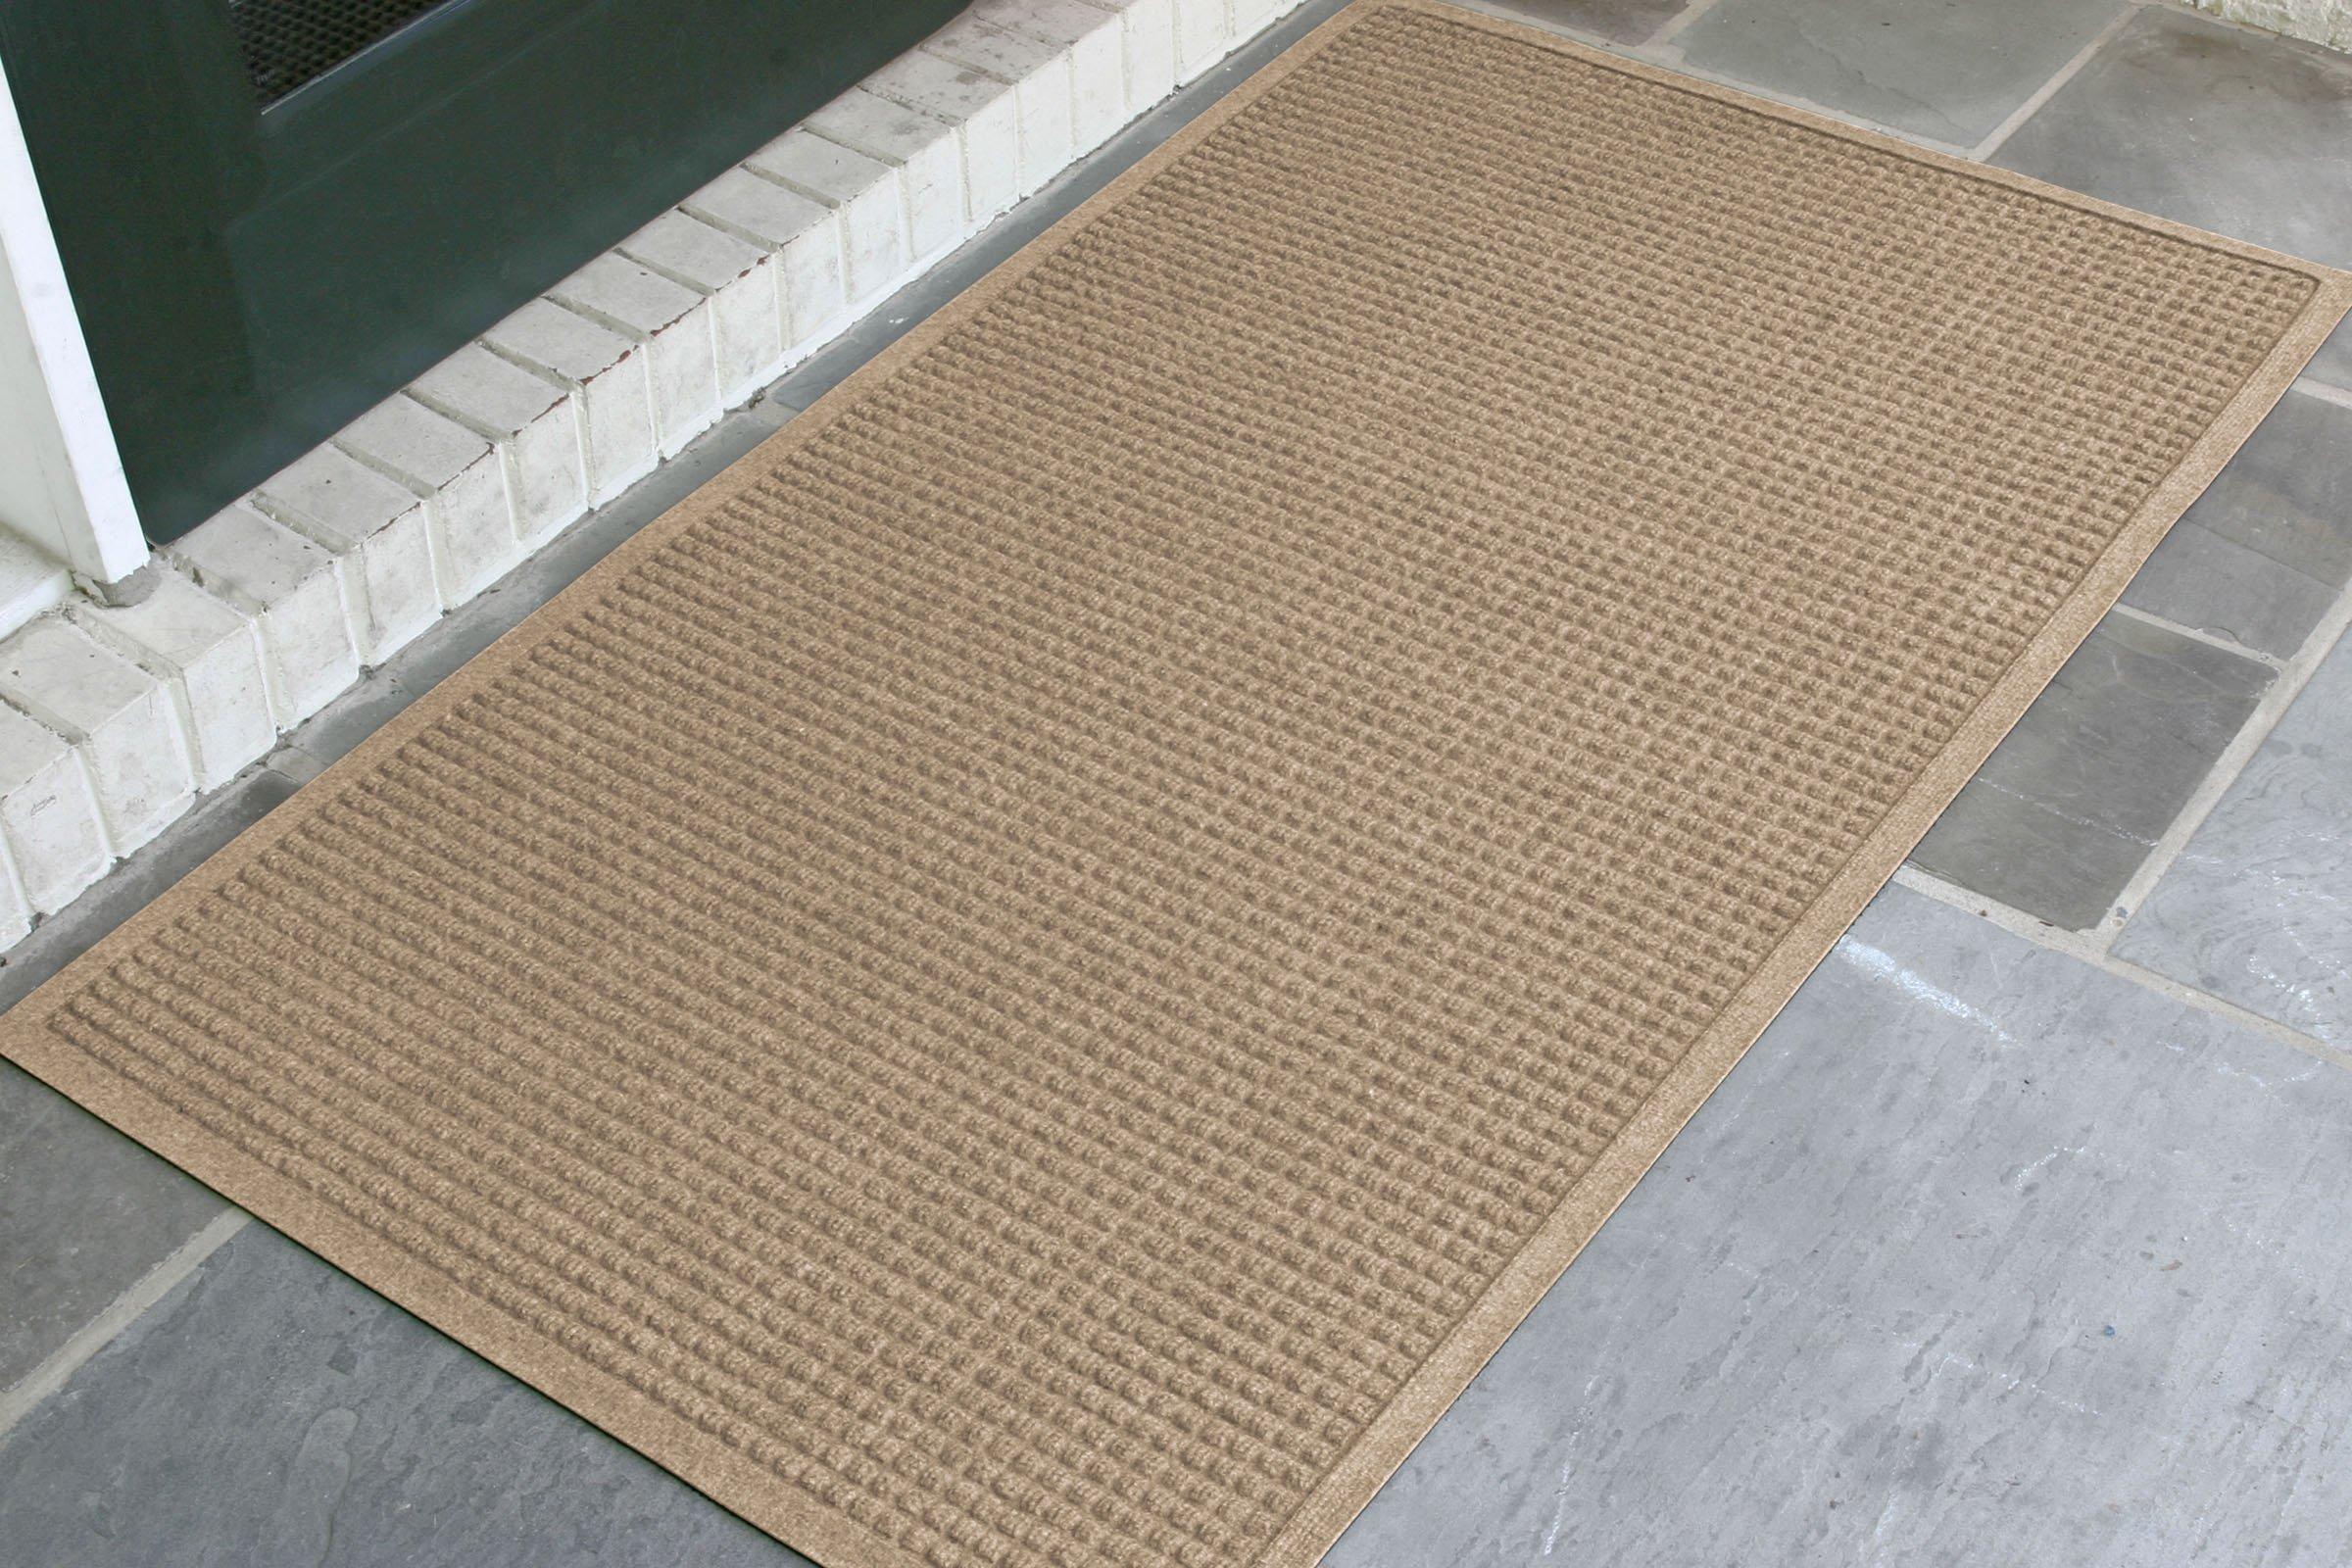 M+A Matting 280 Waterhog ECO Elite Polypropylene Entrance Indoor/Outdoor Floor Mat, SBR Rubber Backing, 5' Length x 3' Width, 3/8'' Thick, Camel by M+A Matting